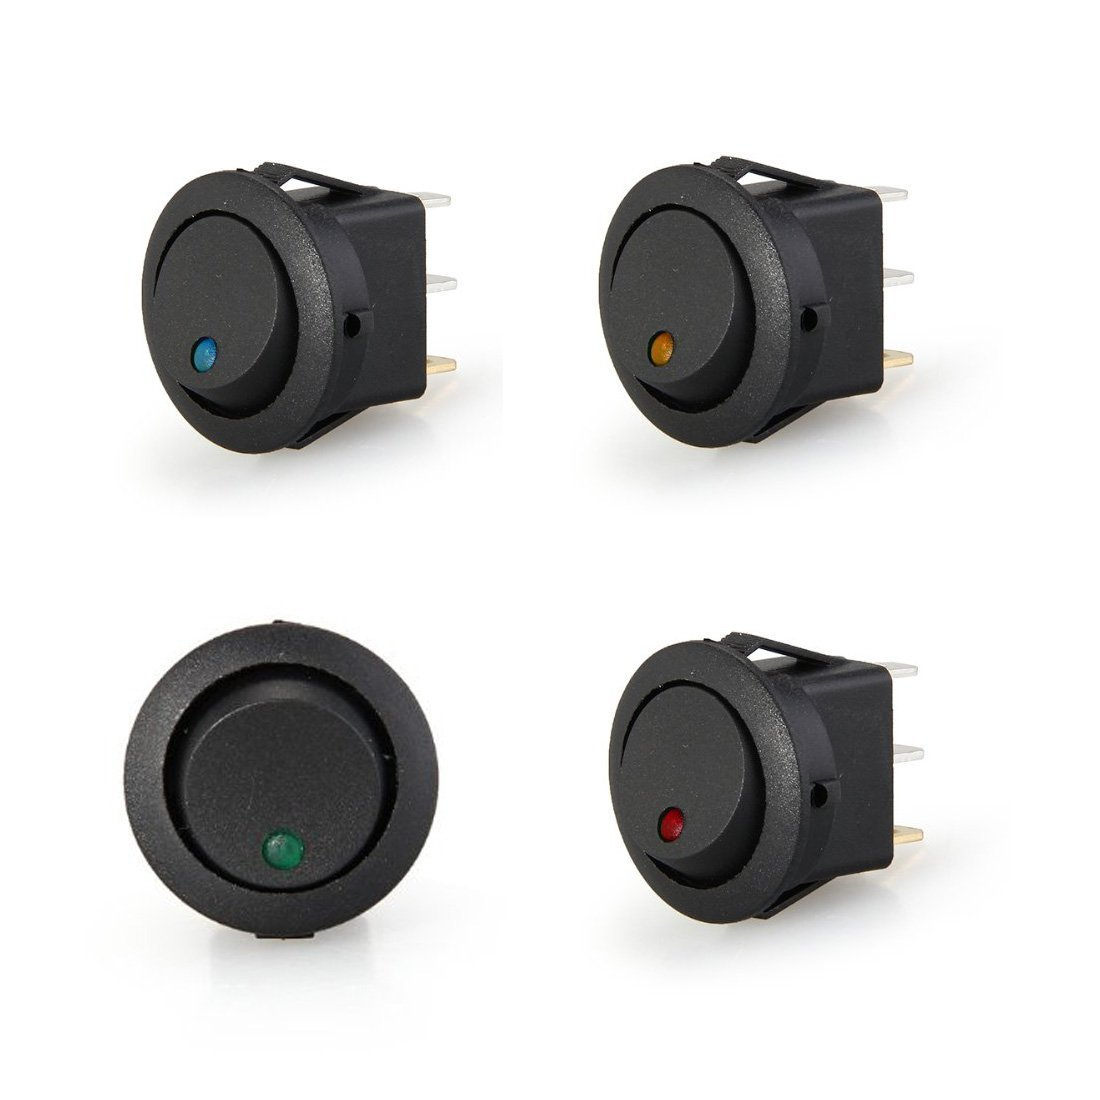 4 pcs led Rocker Indicator Switch 3 Pin On-Off 12V Dc New Durable High Quality Mini Round